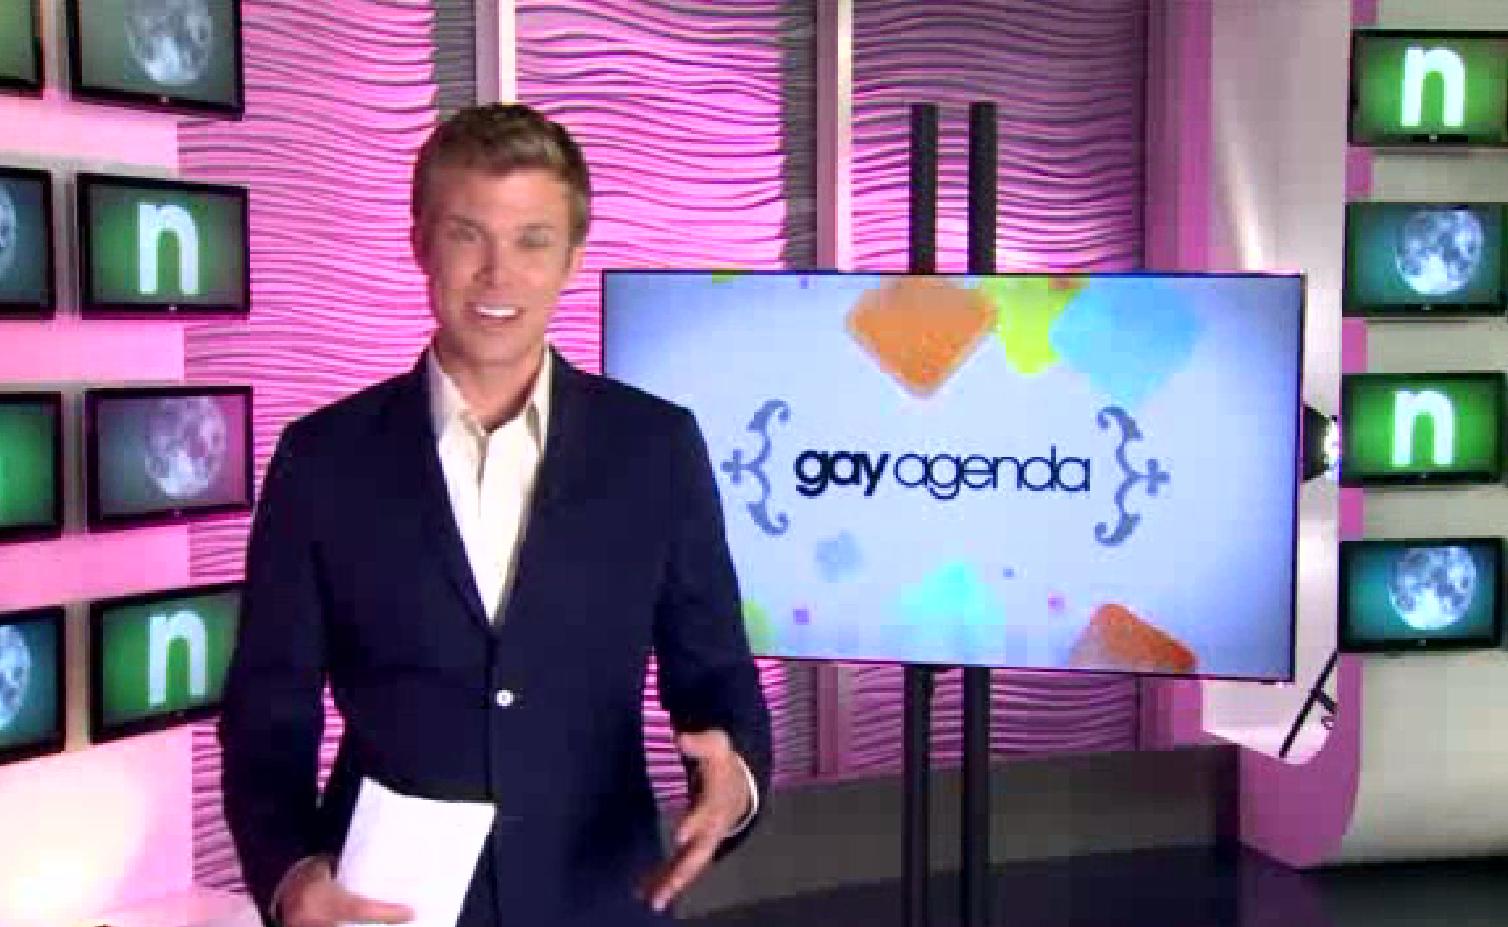 WATCH: CW33's Gay Agenda